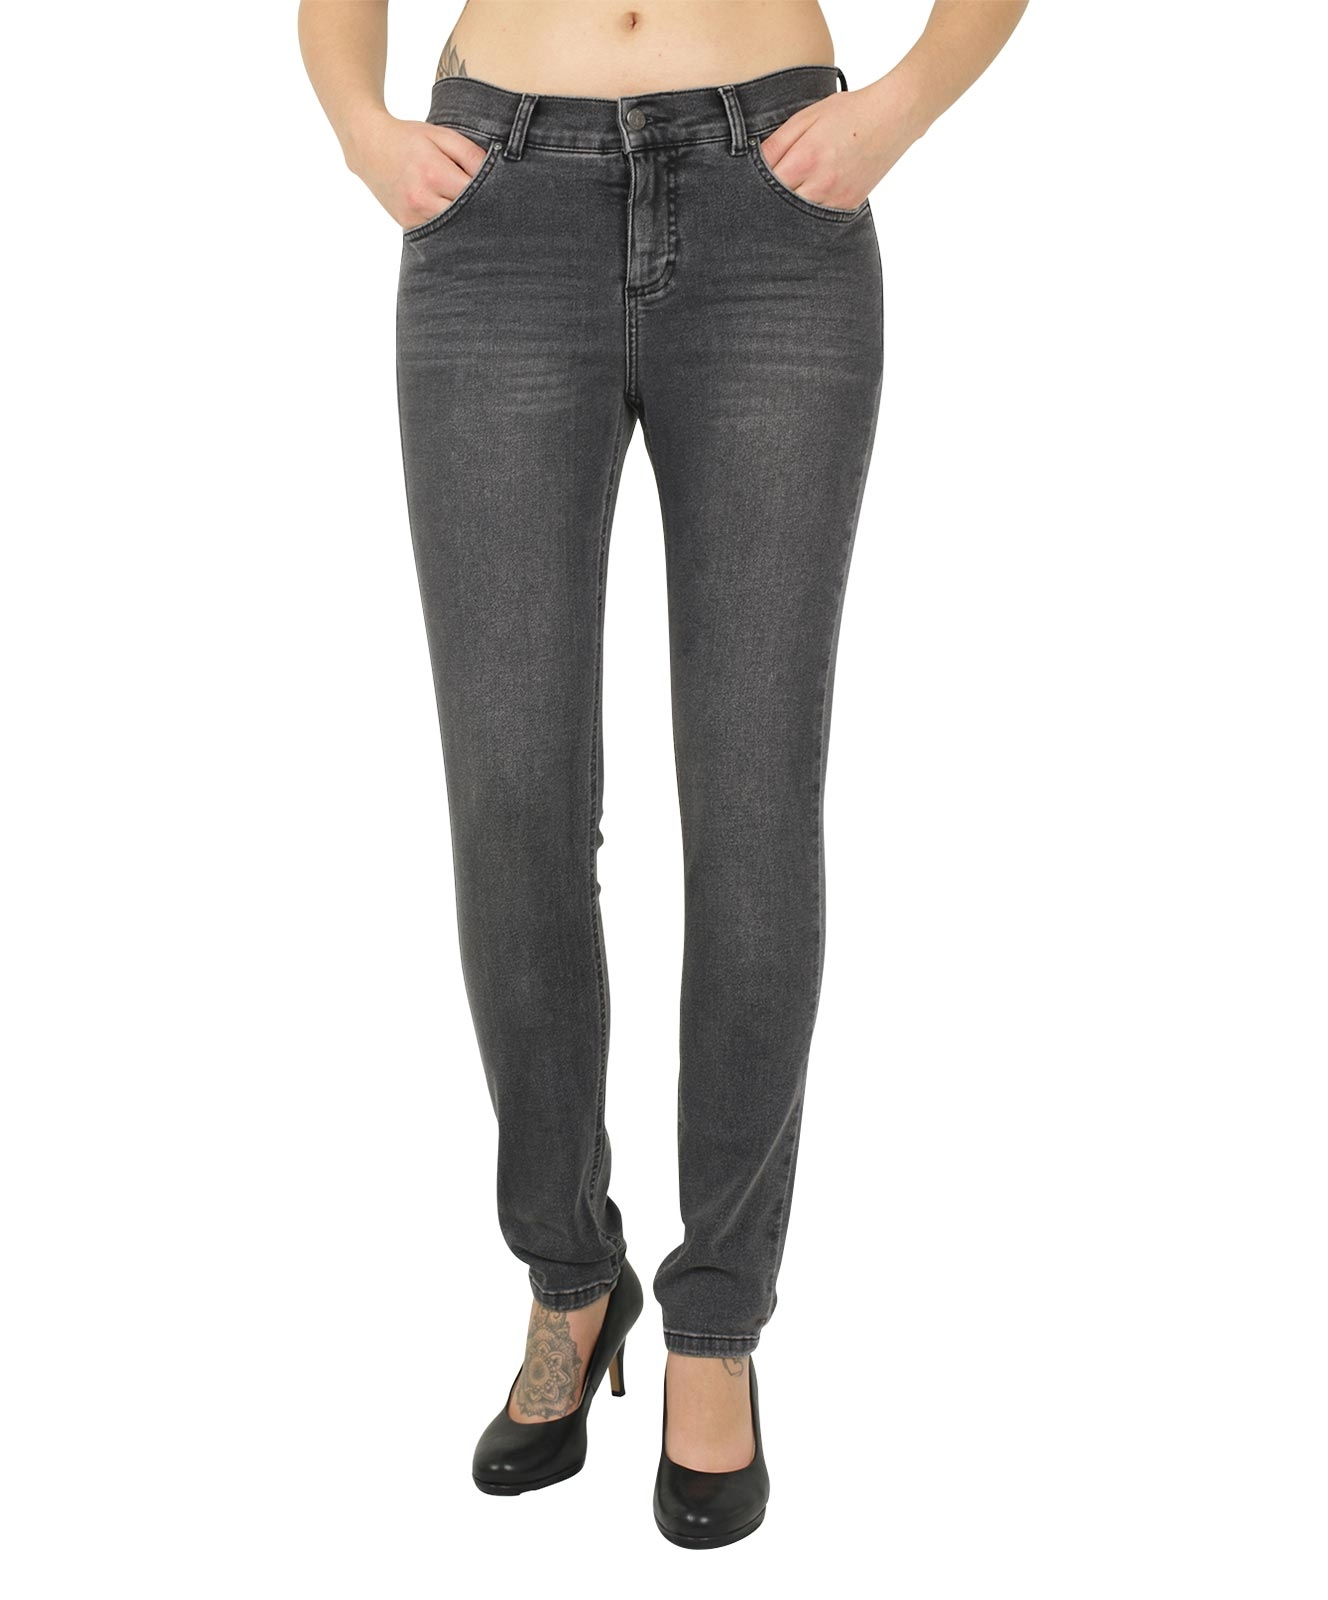 Hosen - Angels Jeans Röhre Skinny in Grey Used  - Onlineshop Jeans Meile